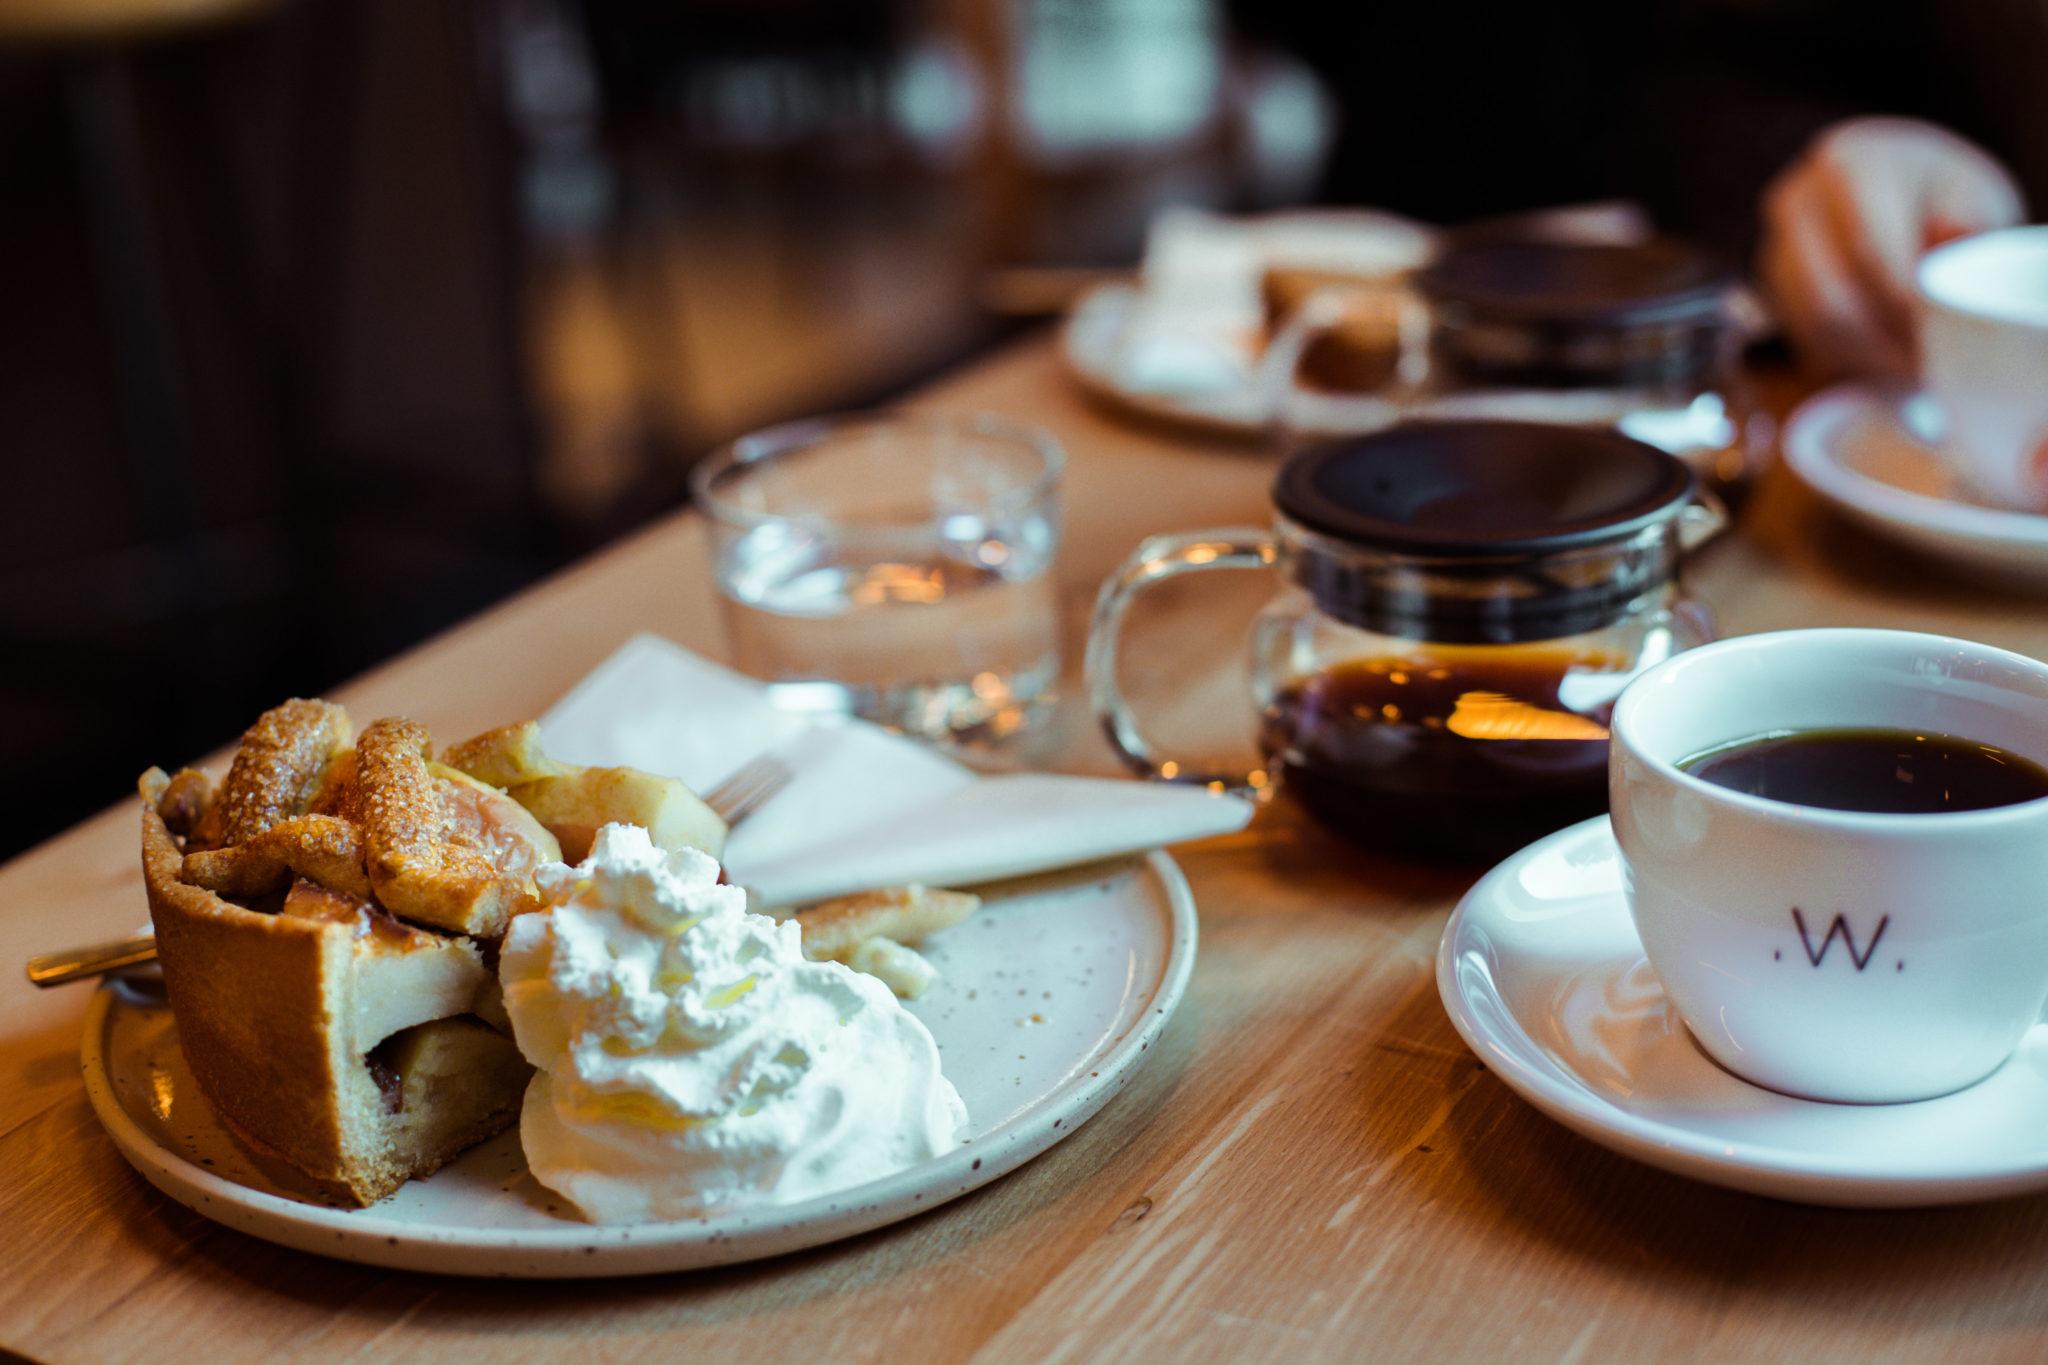 Schuurmanoomkensgrassotti koffie- en wijnbar in Amsterdam